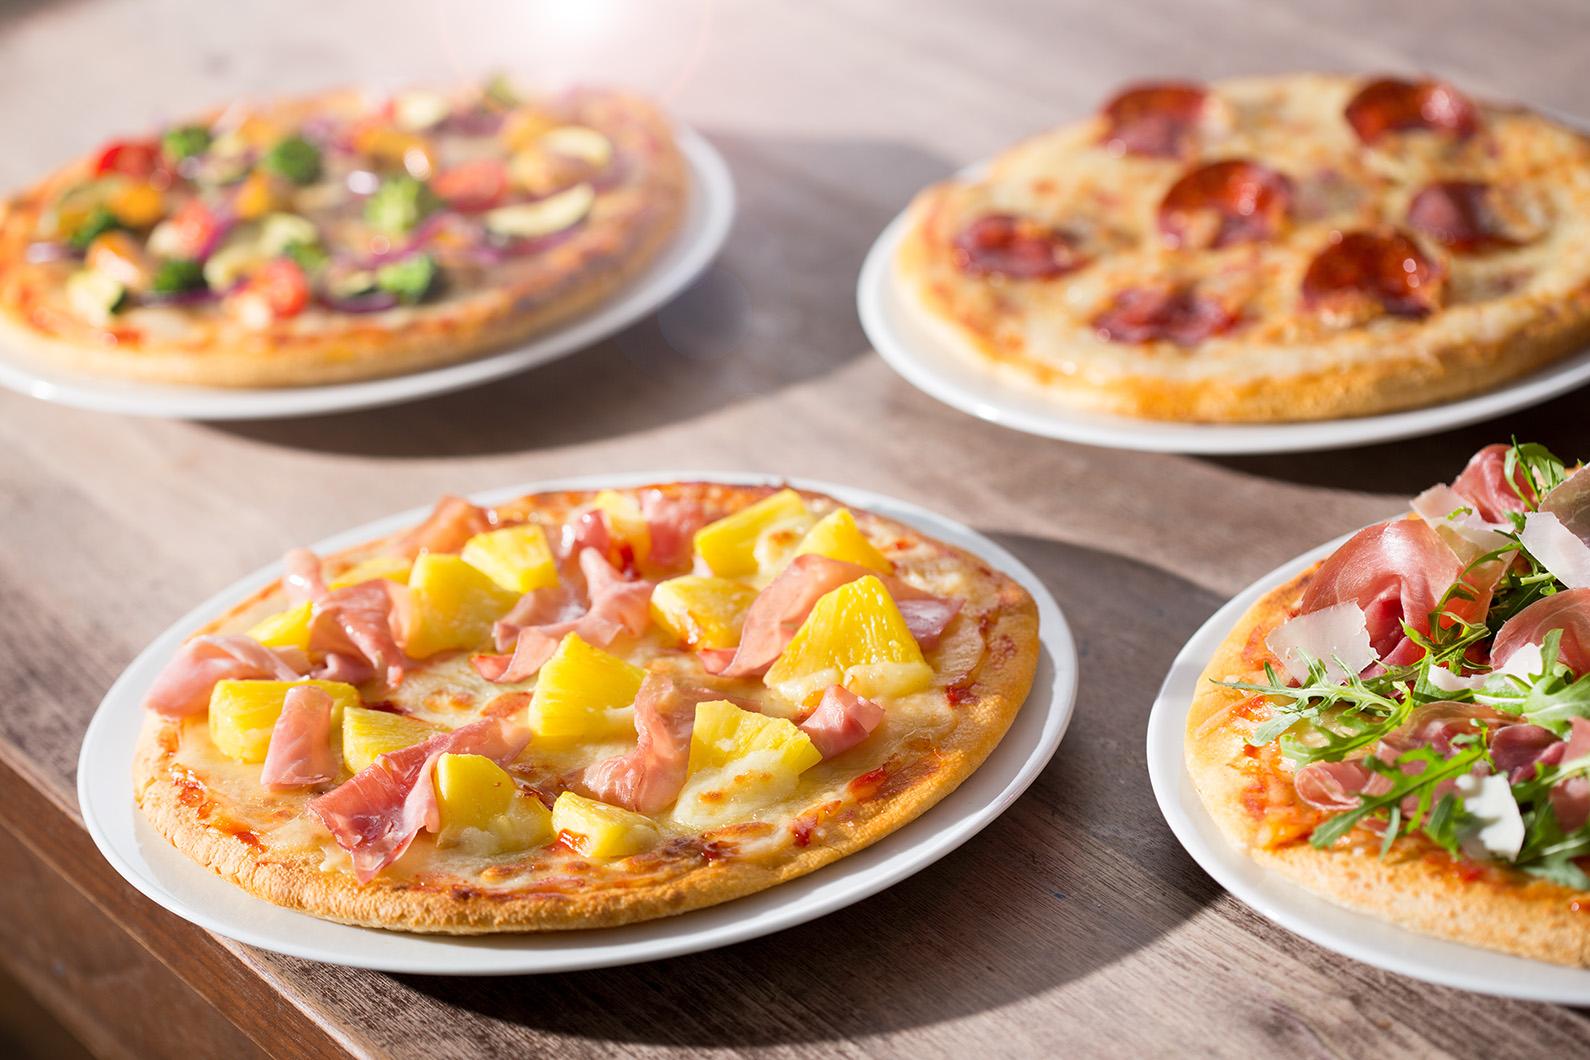 Foto de MUNDFEIN Pizzawerkstatt HH-Hohenfelde